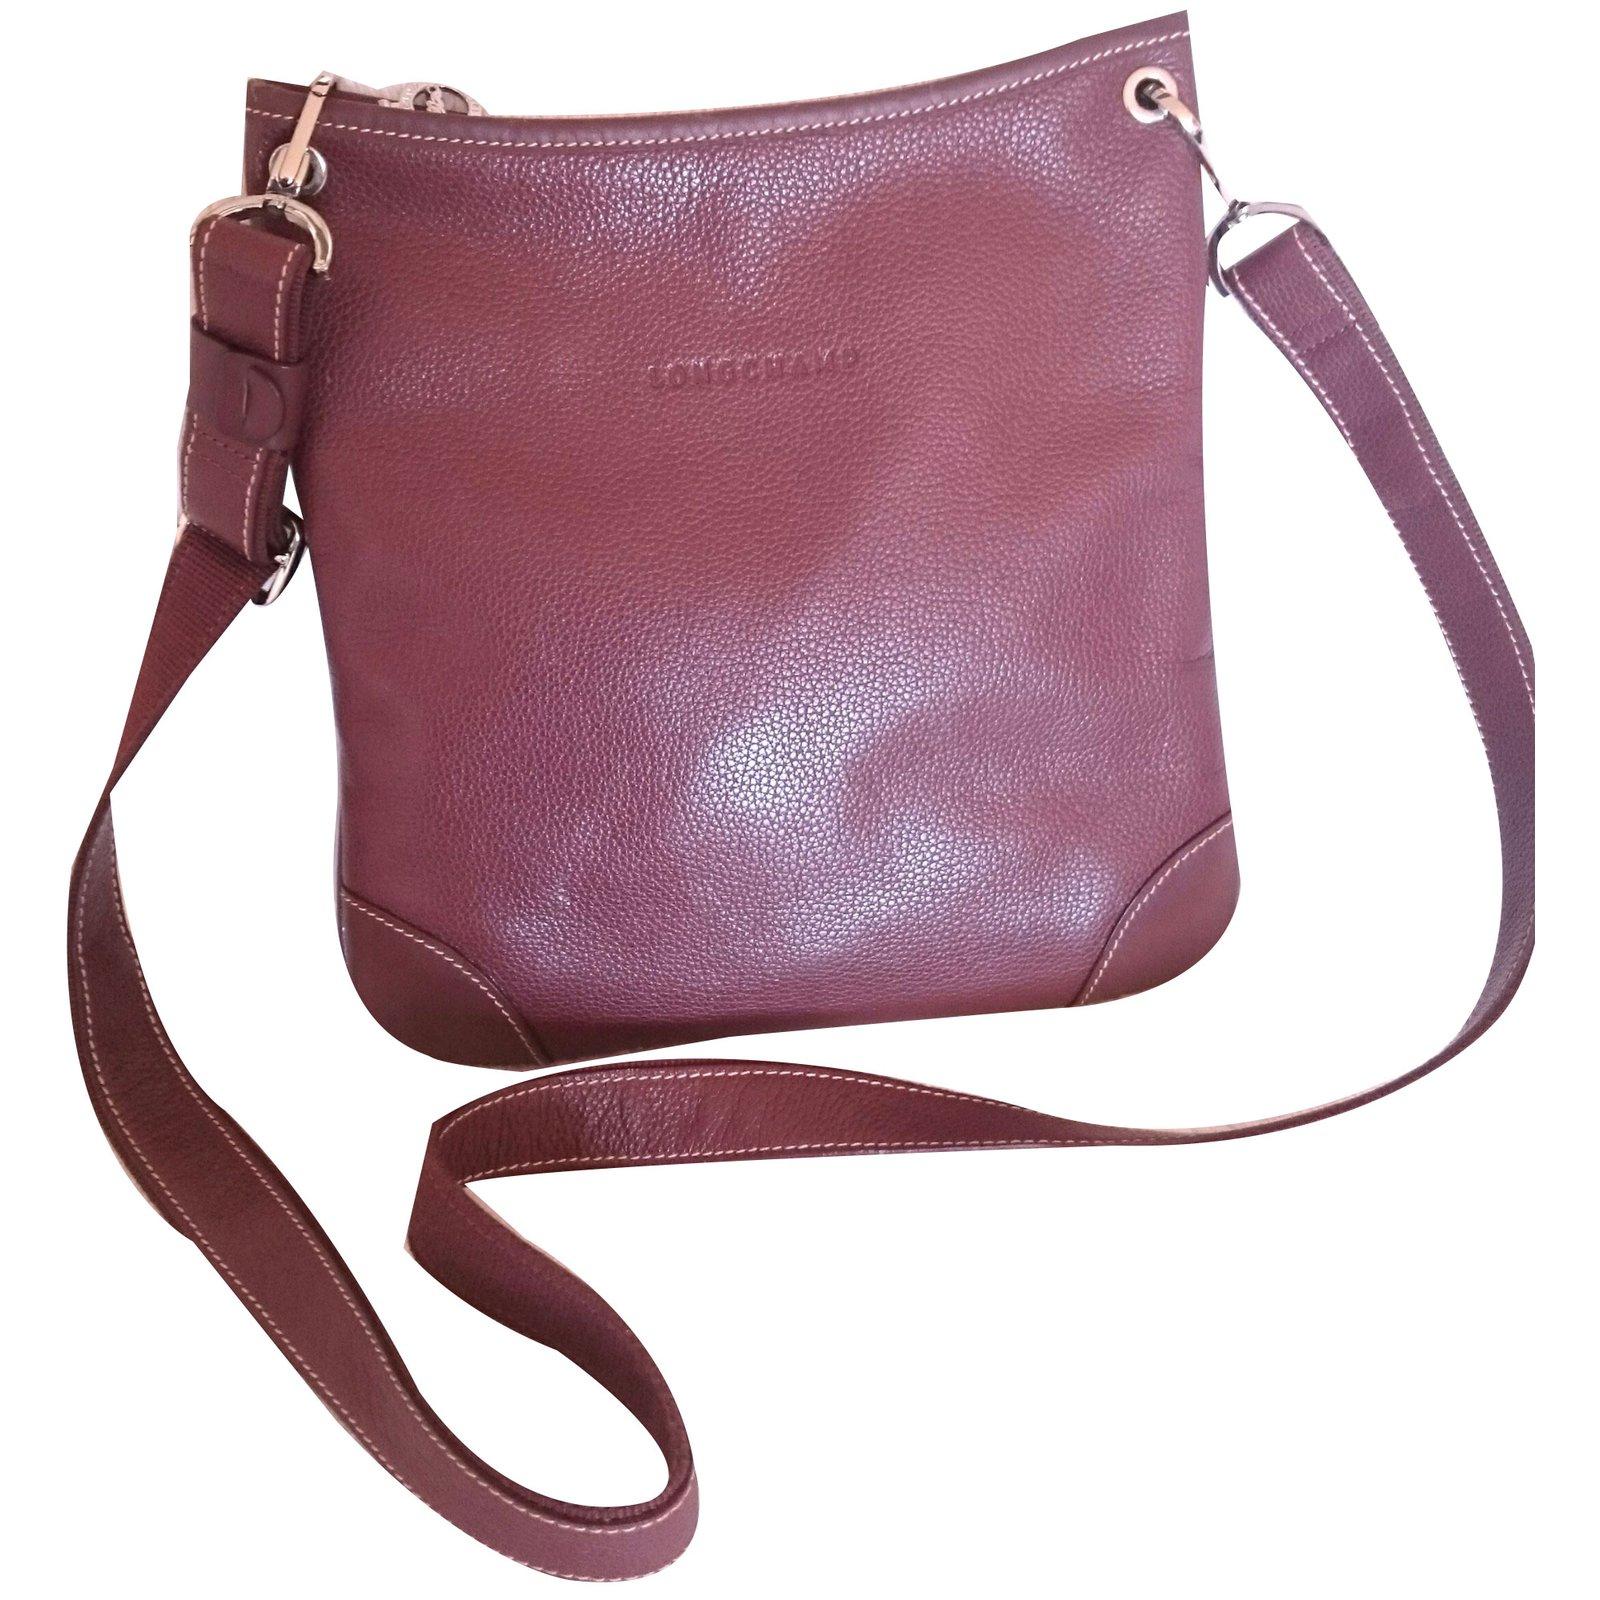 37f20500a9c2 Longchamp Handbags Handbags Leather Brown ref.66482 - Joli Closet